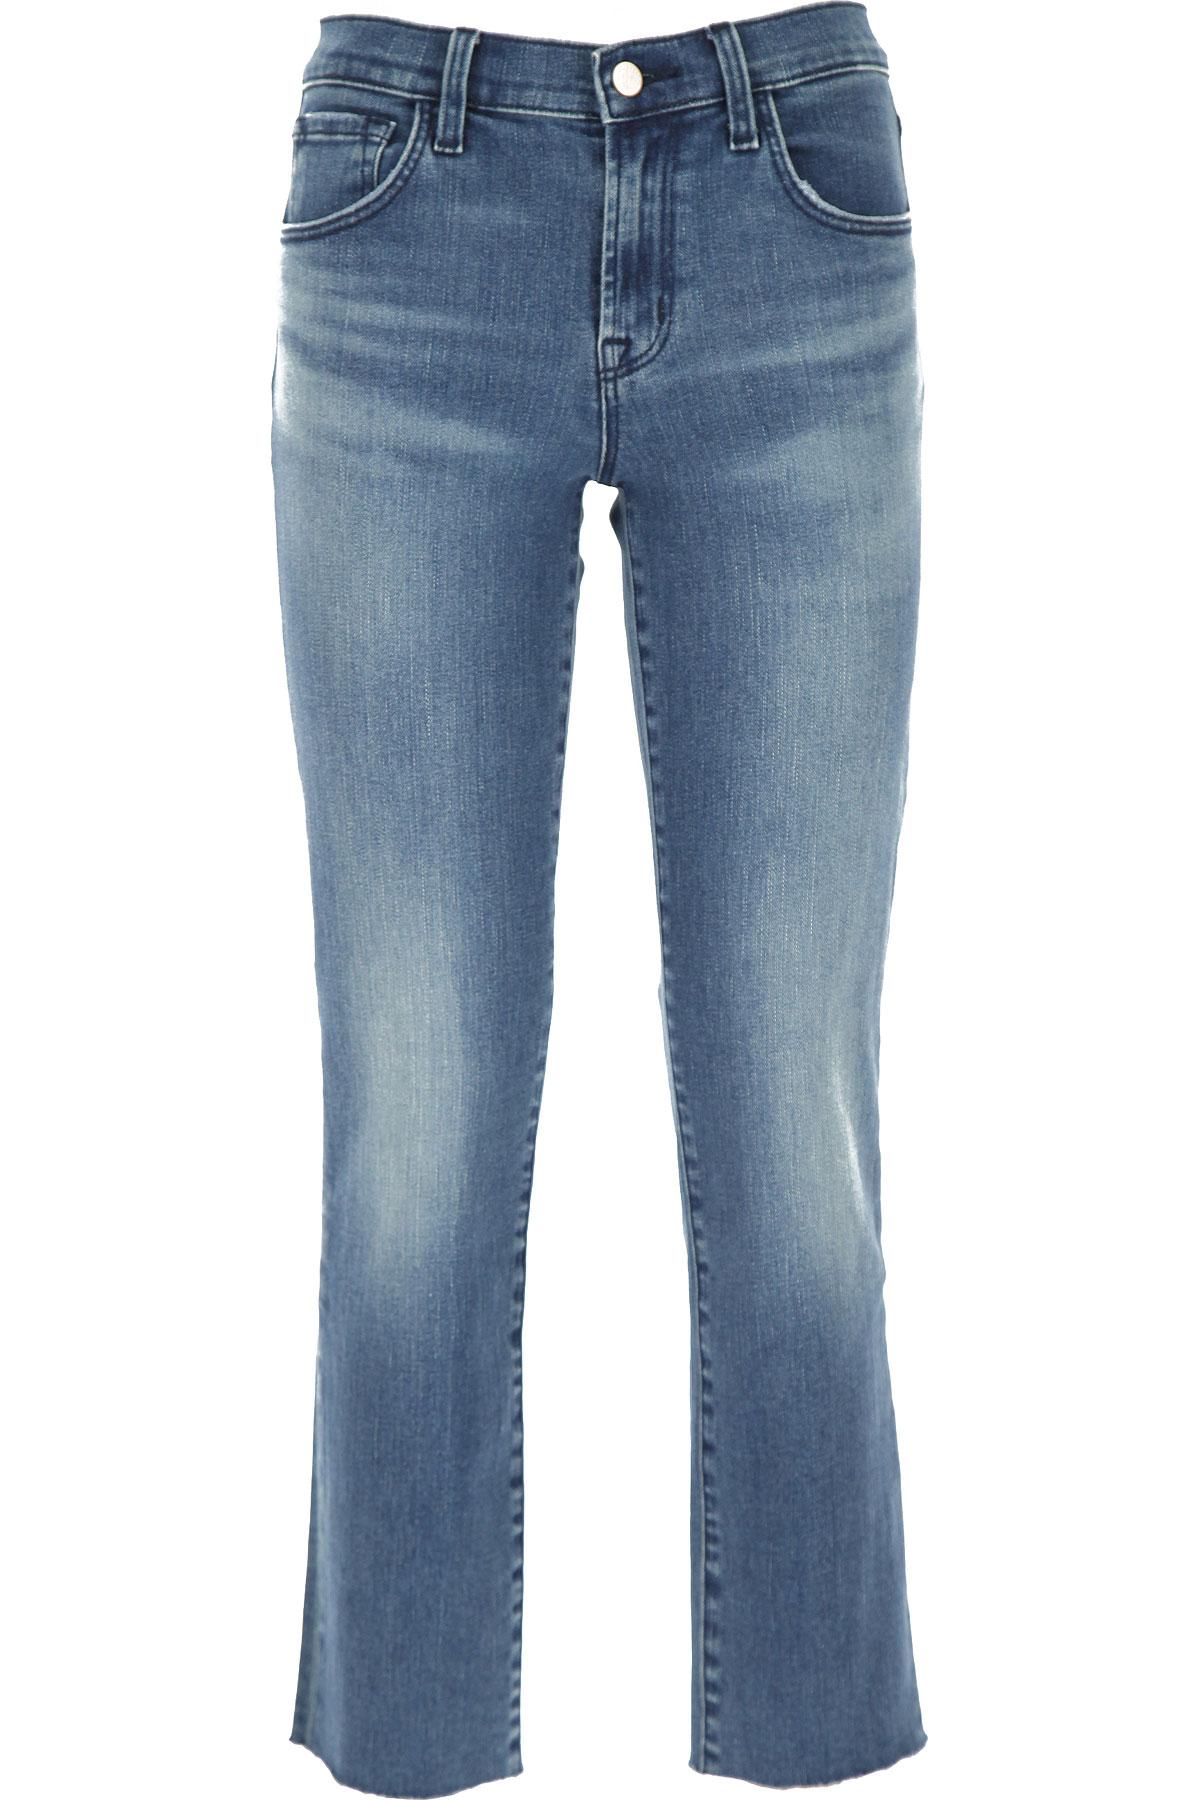 J Brand Jeans On Sale, Blu Denim, Cotton, 2019, 24 25 26 27 28 29 30